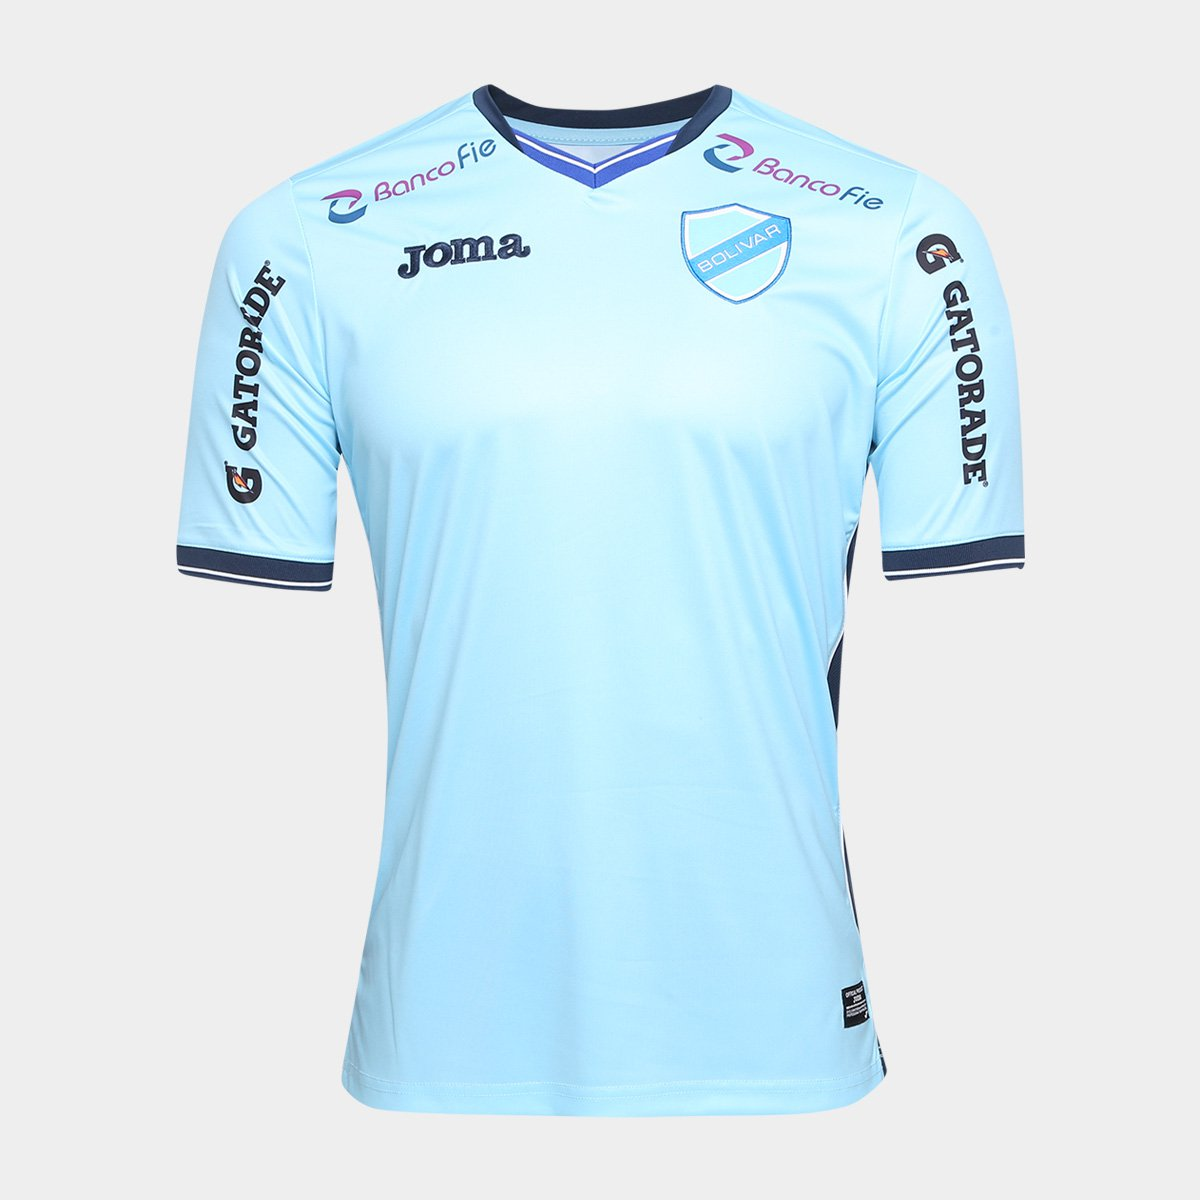 8ef14c0666d1c Camisa Bolivar Home 17 18 s n° - Torcedor Joma Masculina